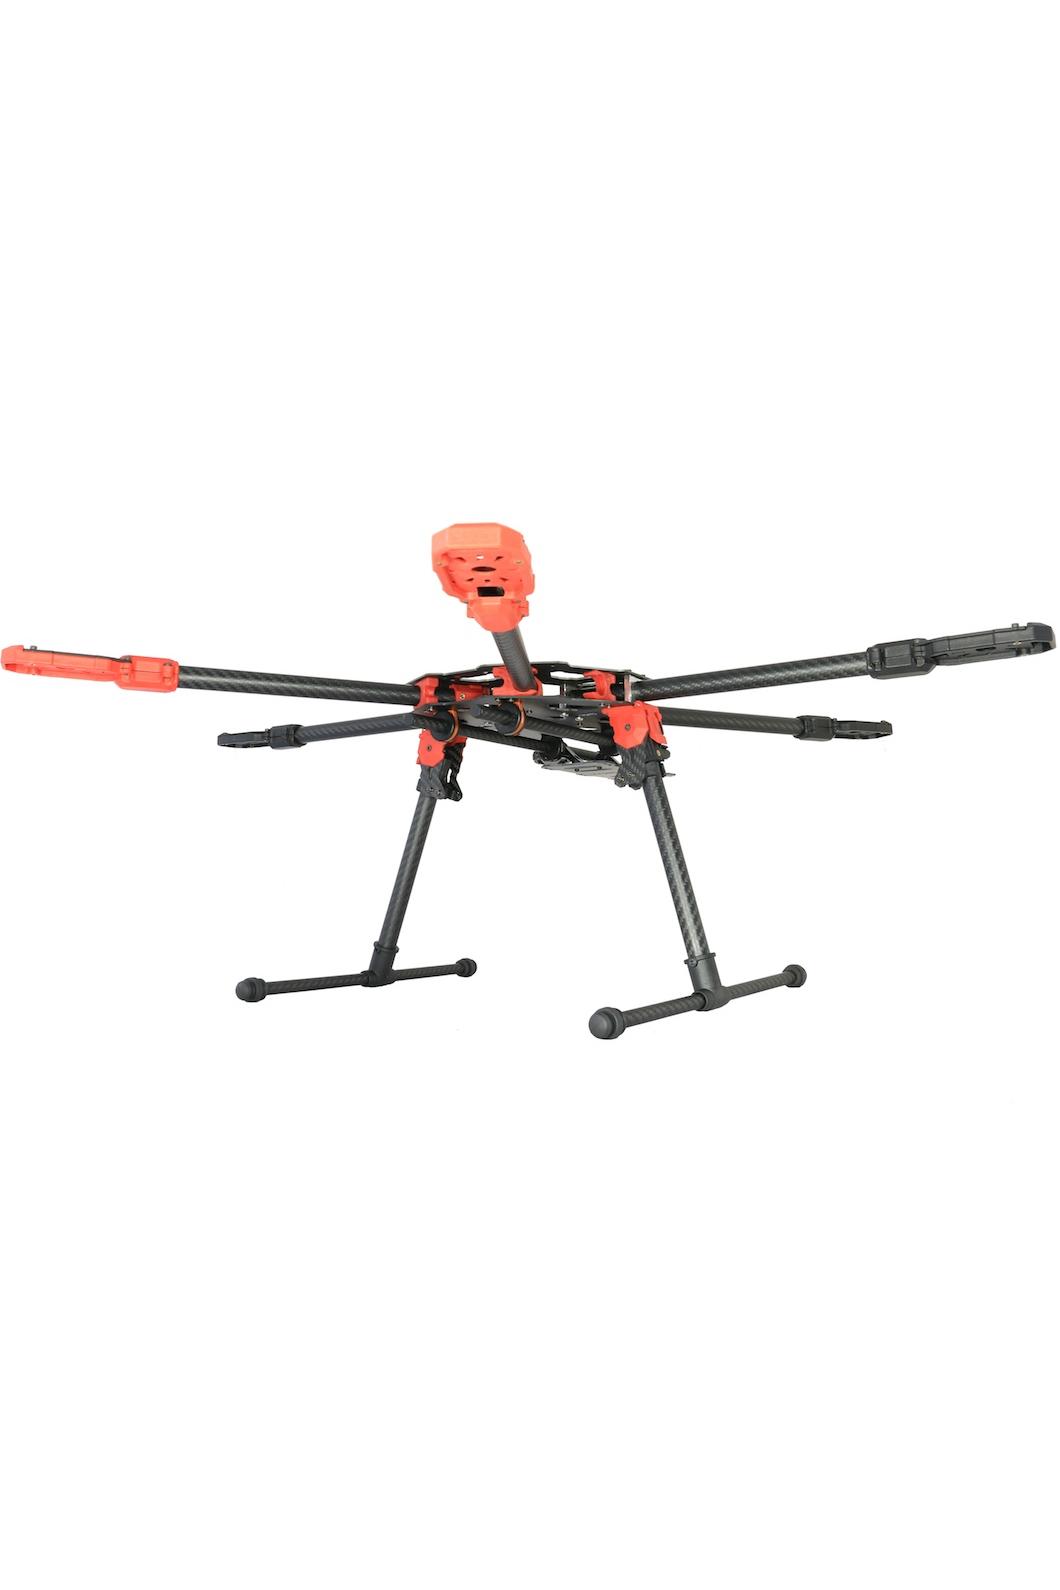 tarot 680 pro carbon fibre foldable hexacopter frame